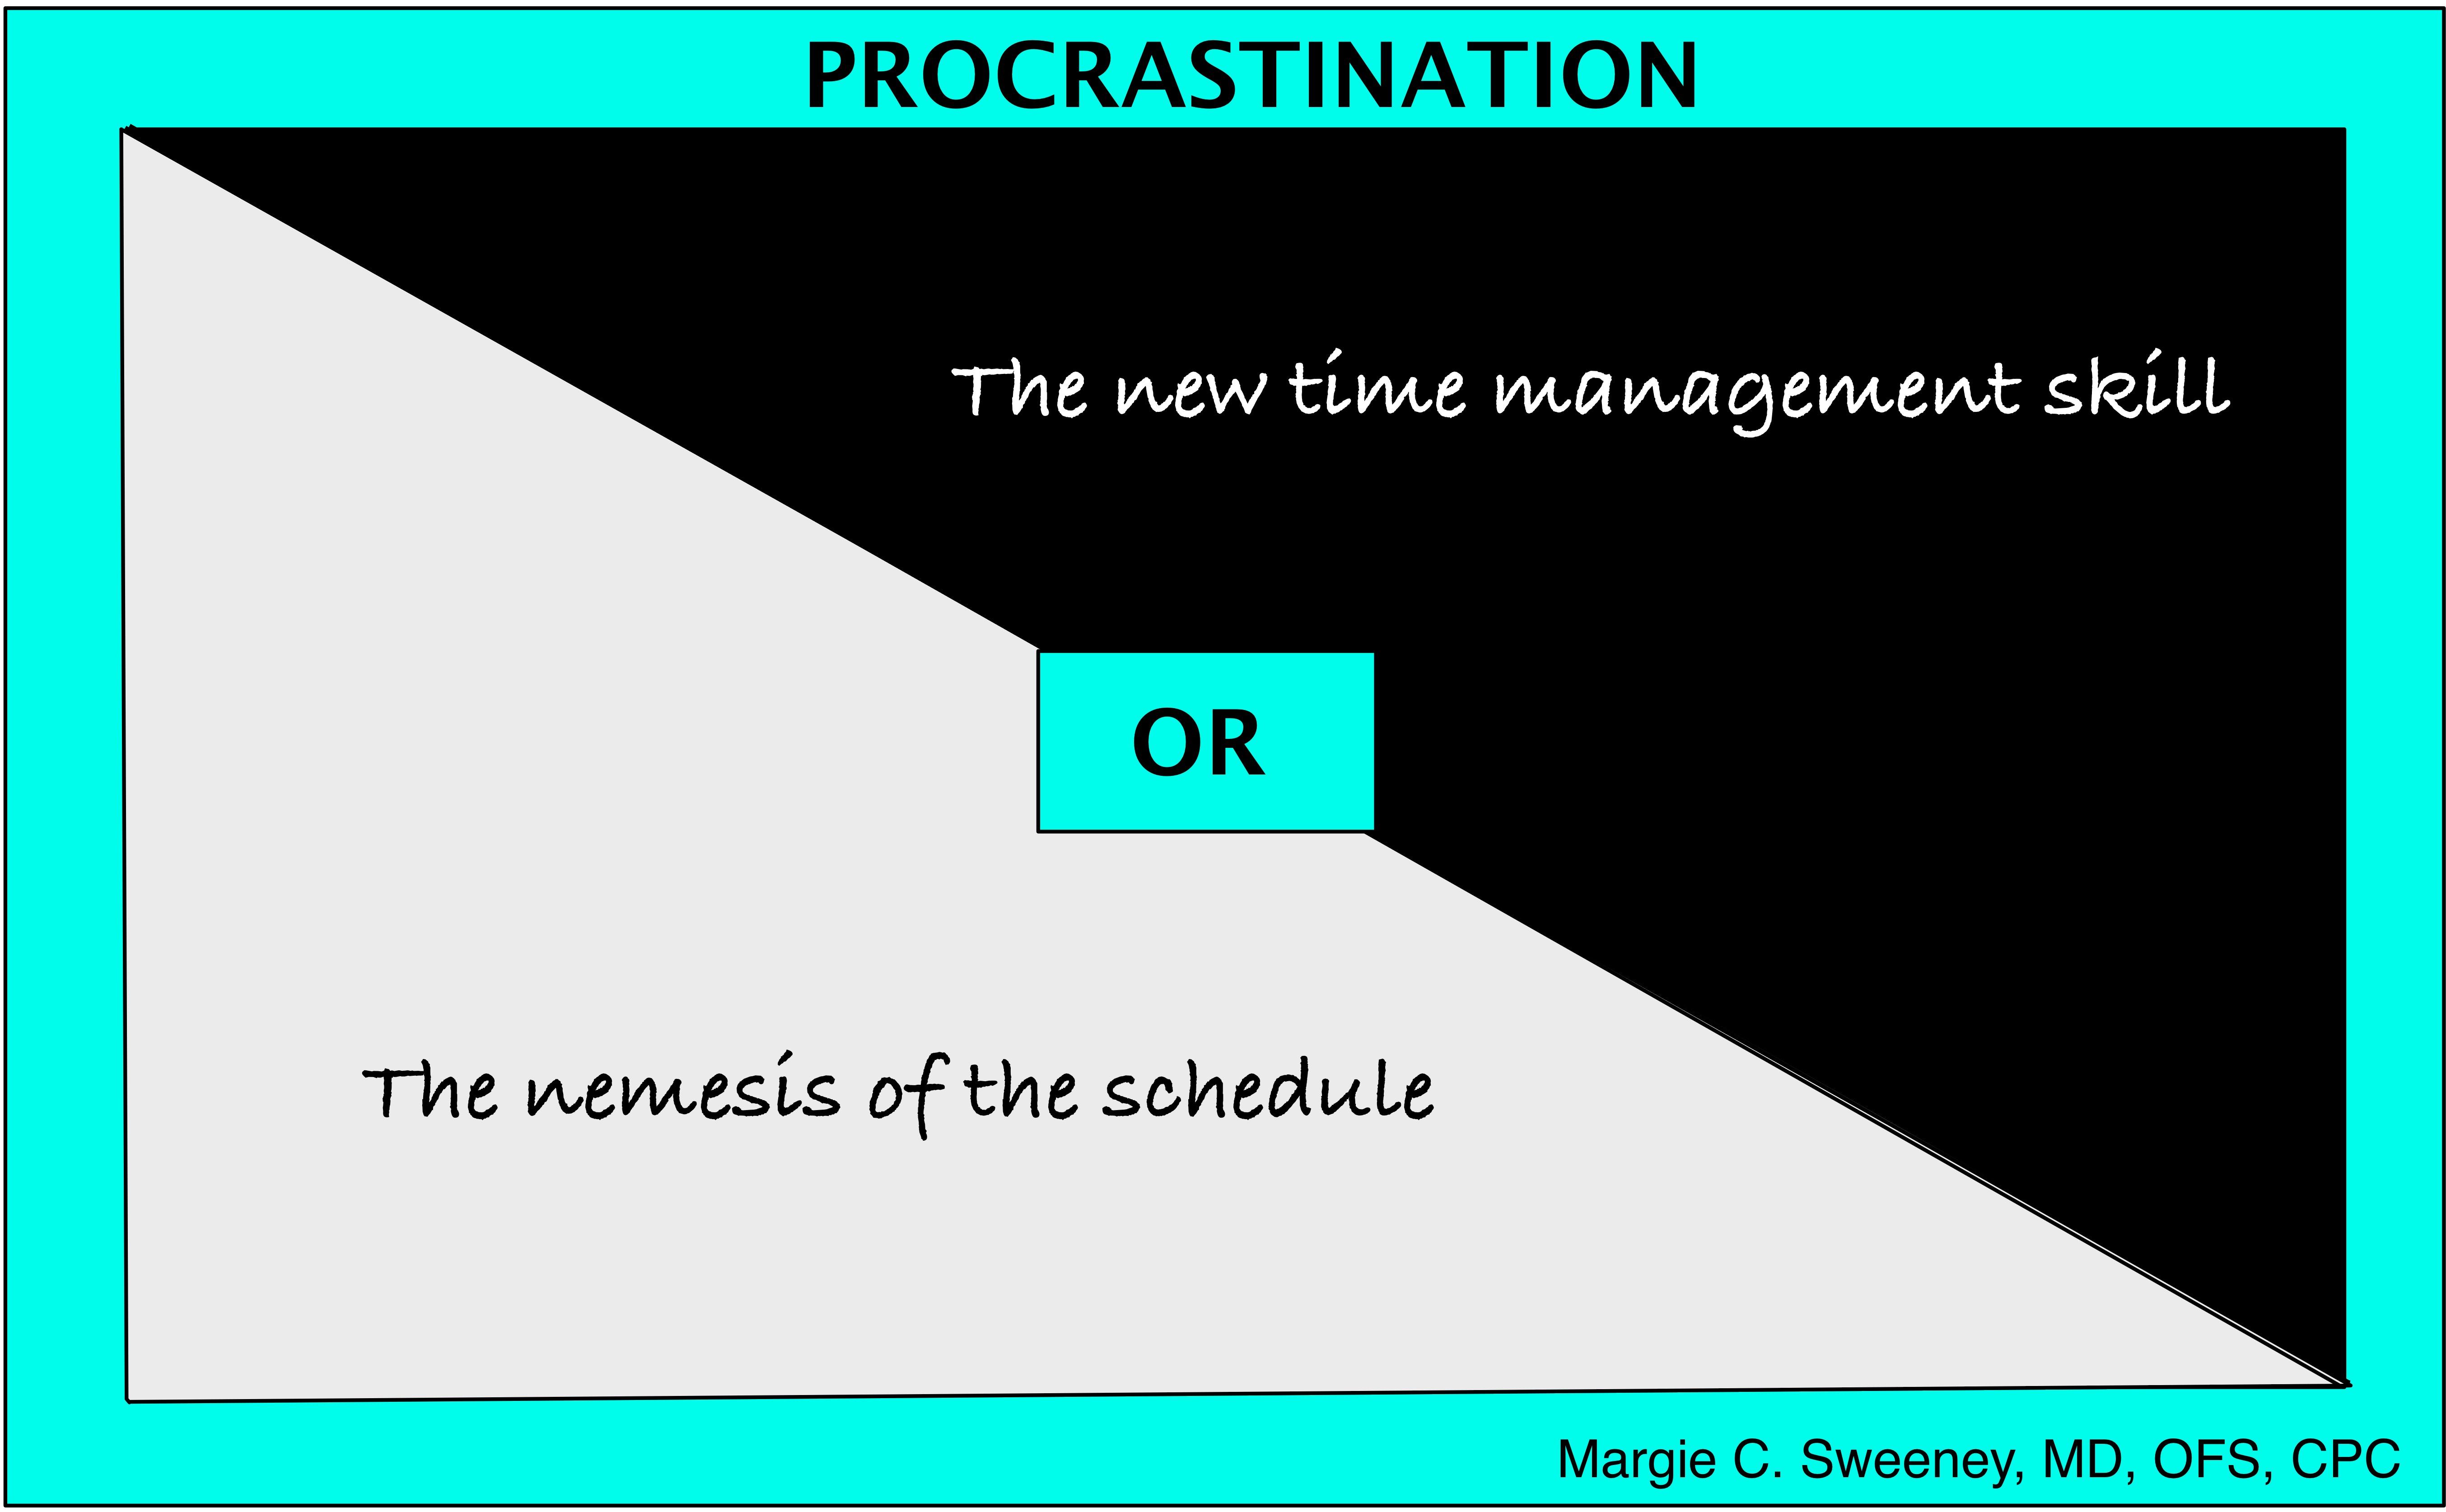 Is Procrastination Good Or Bad